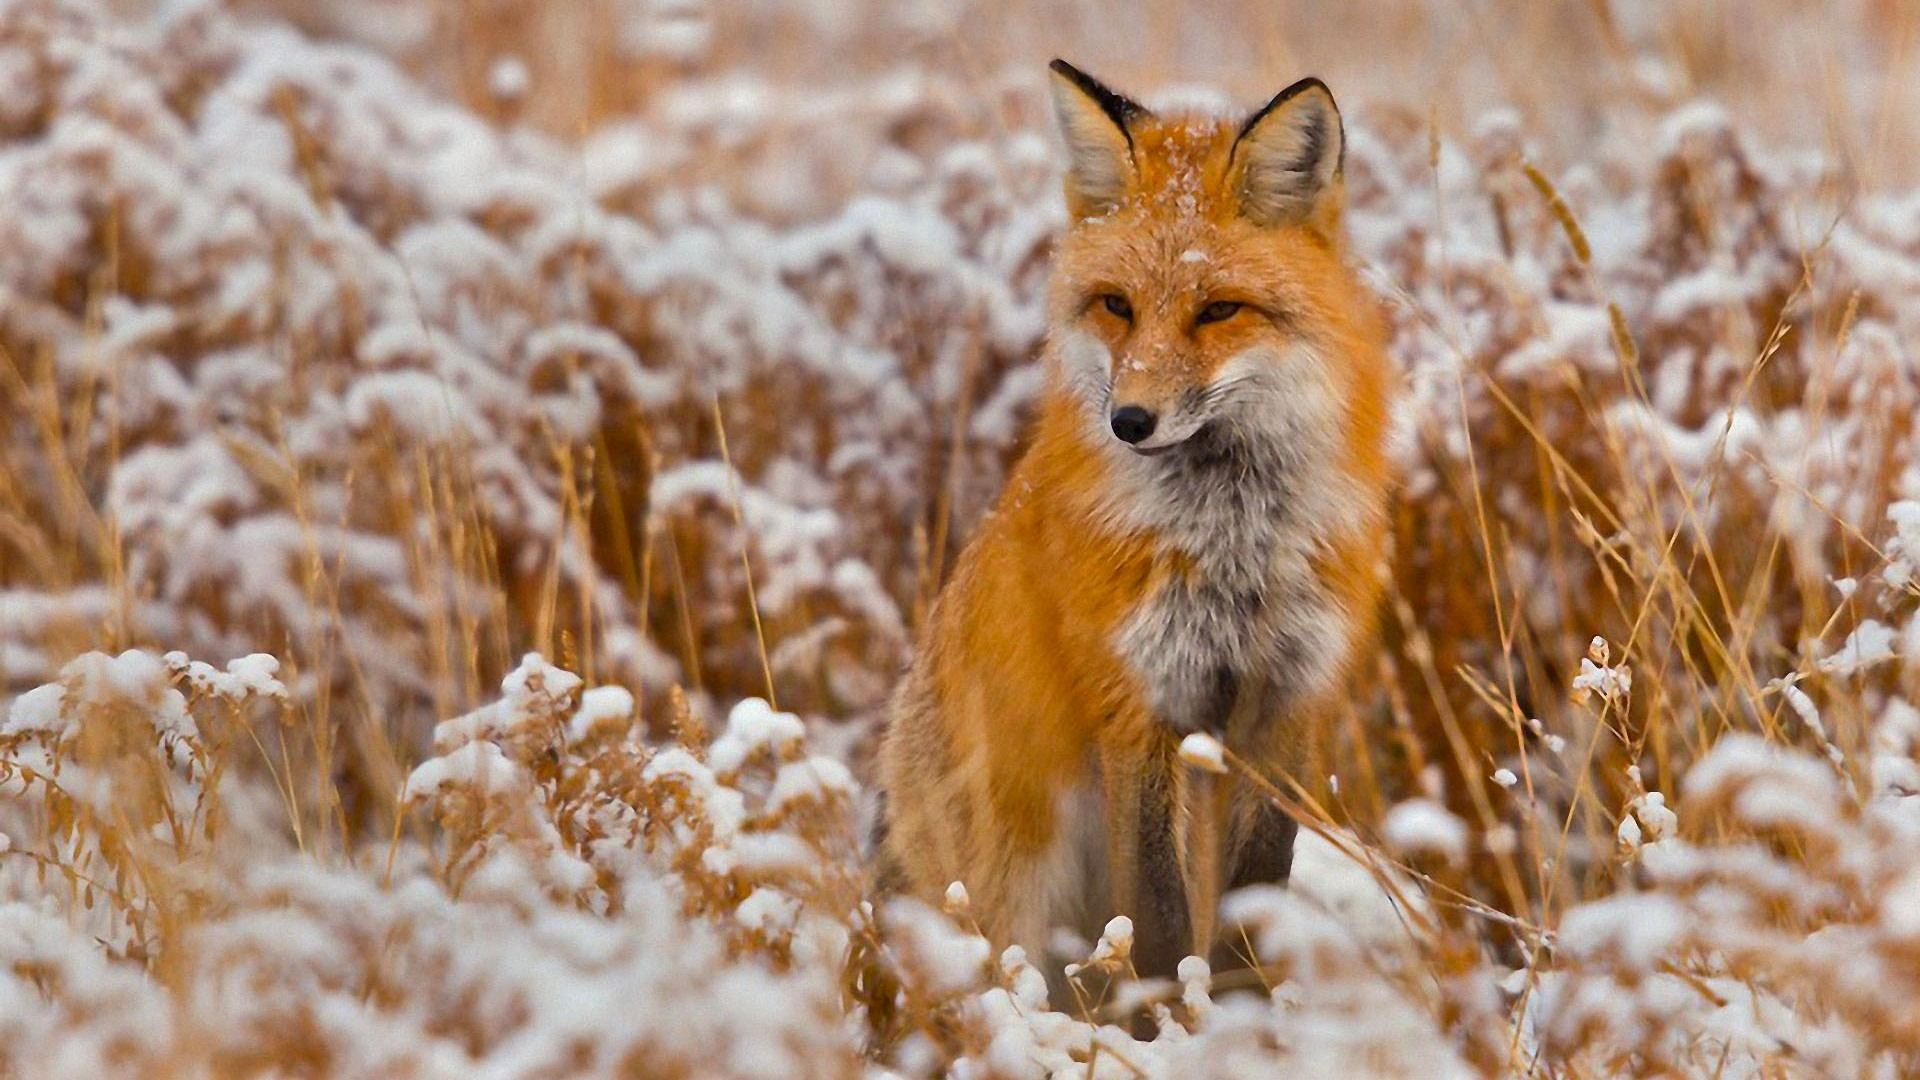 Red fox in winter 1920 x 1080 Wallpaper art Pinterest